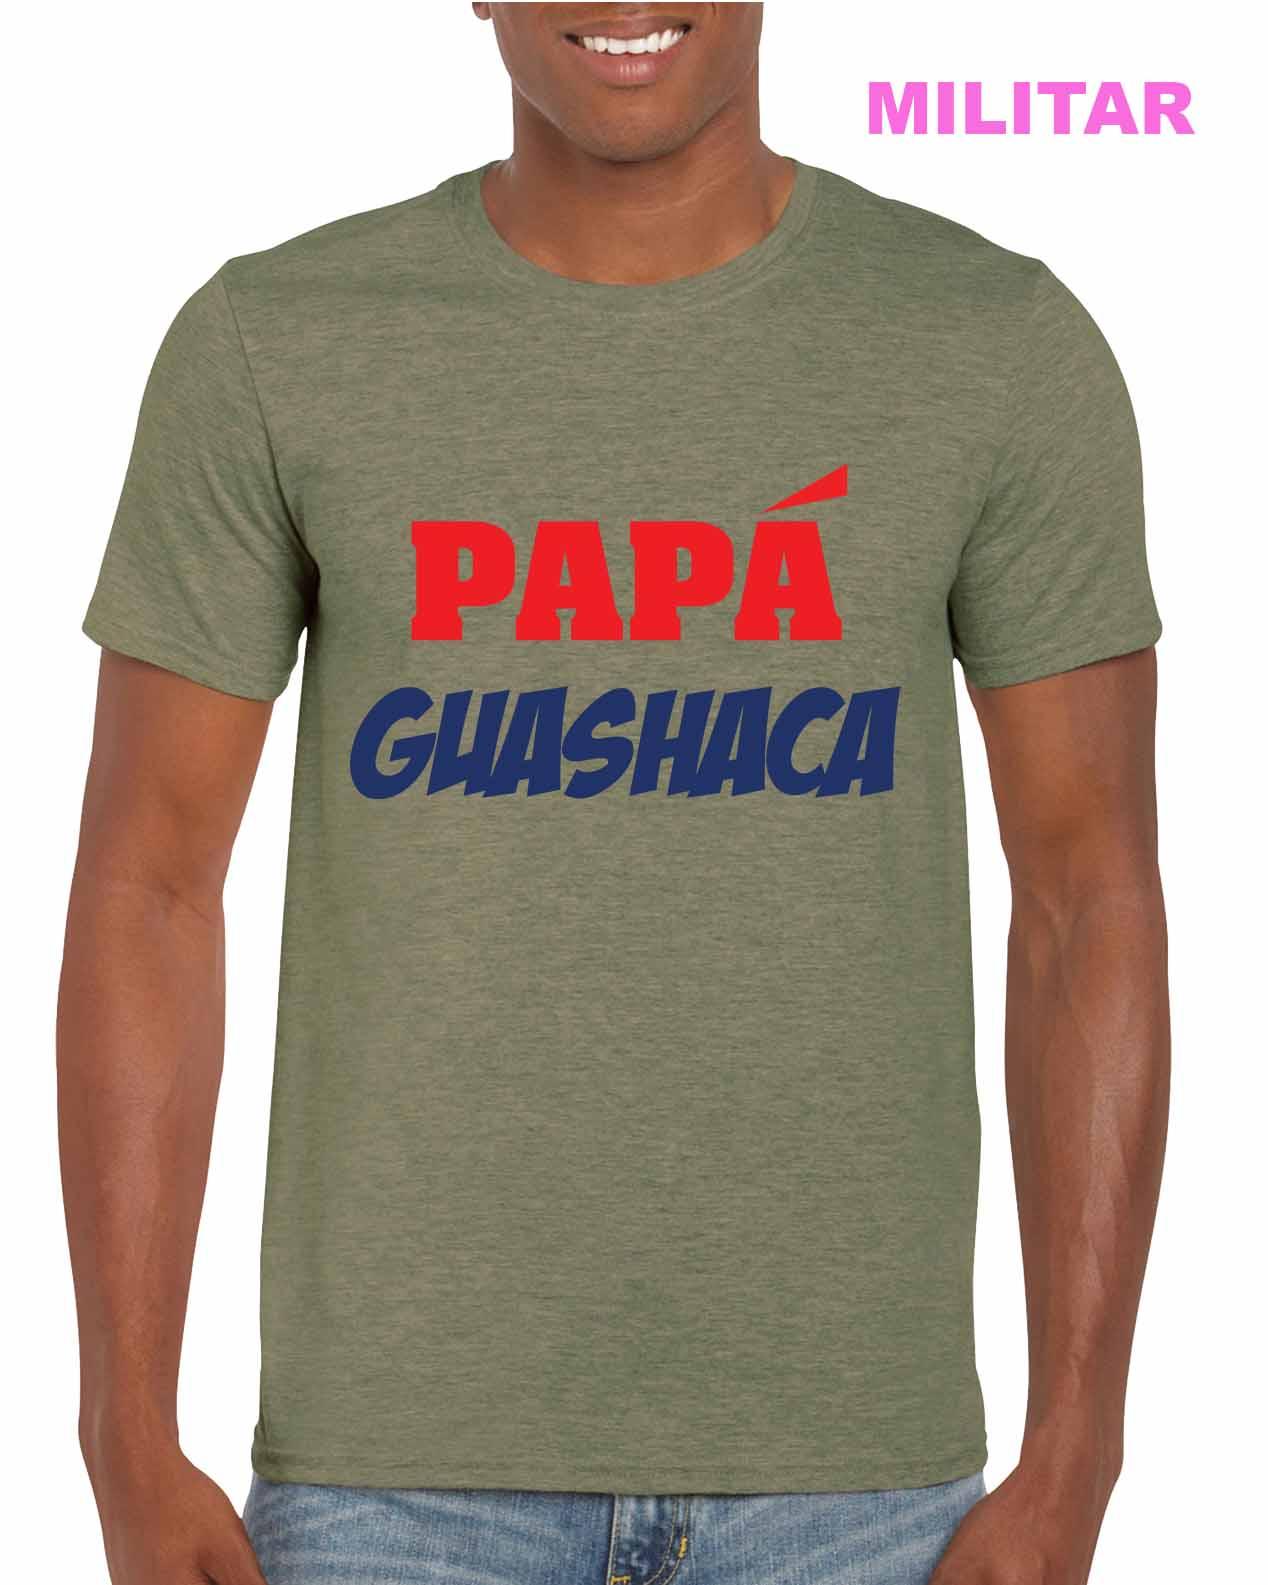 Papá Guachaca